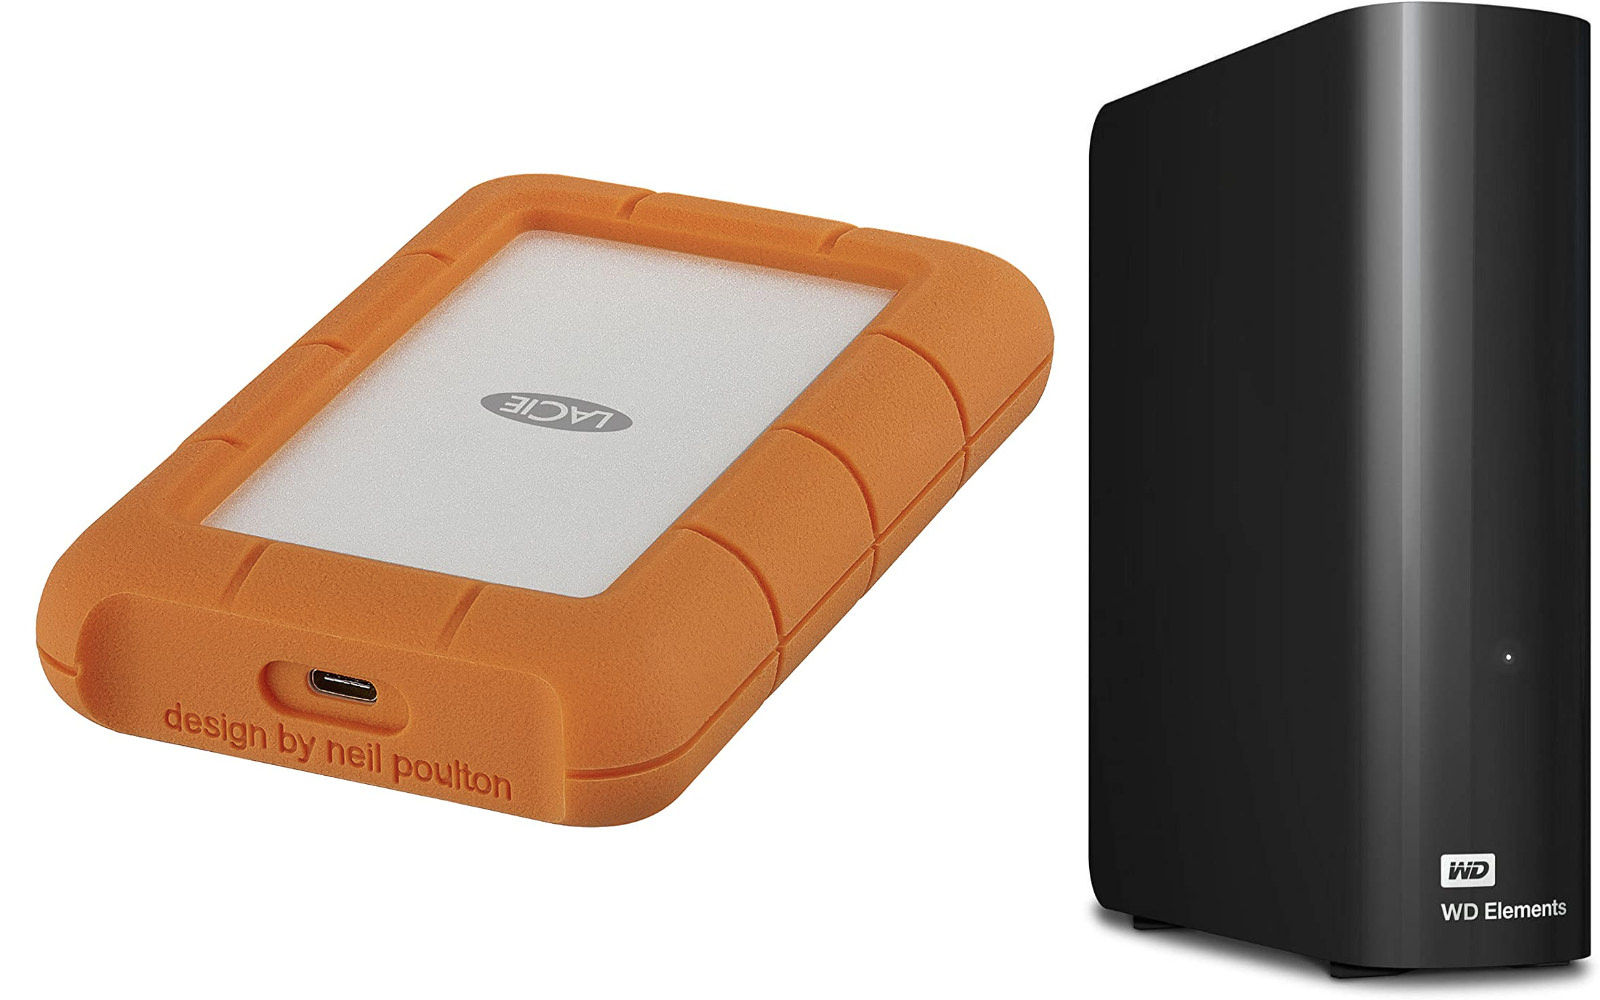 HDD-Drive-on-sale.jpg